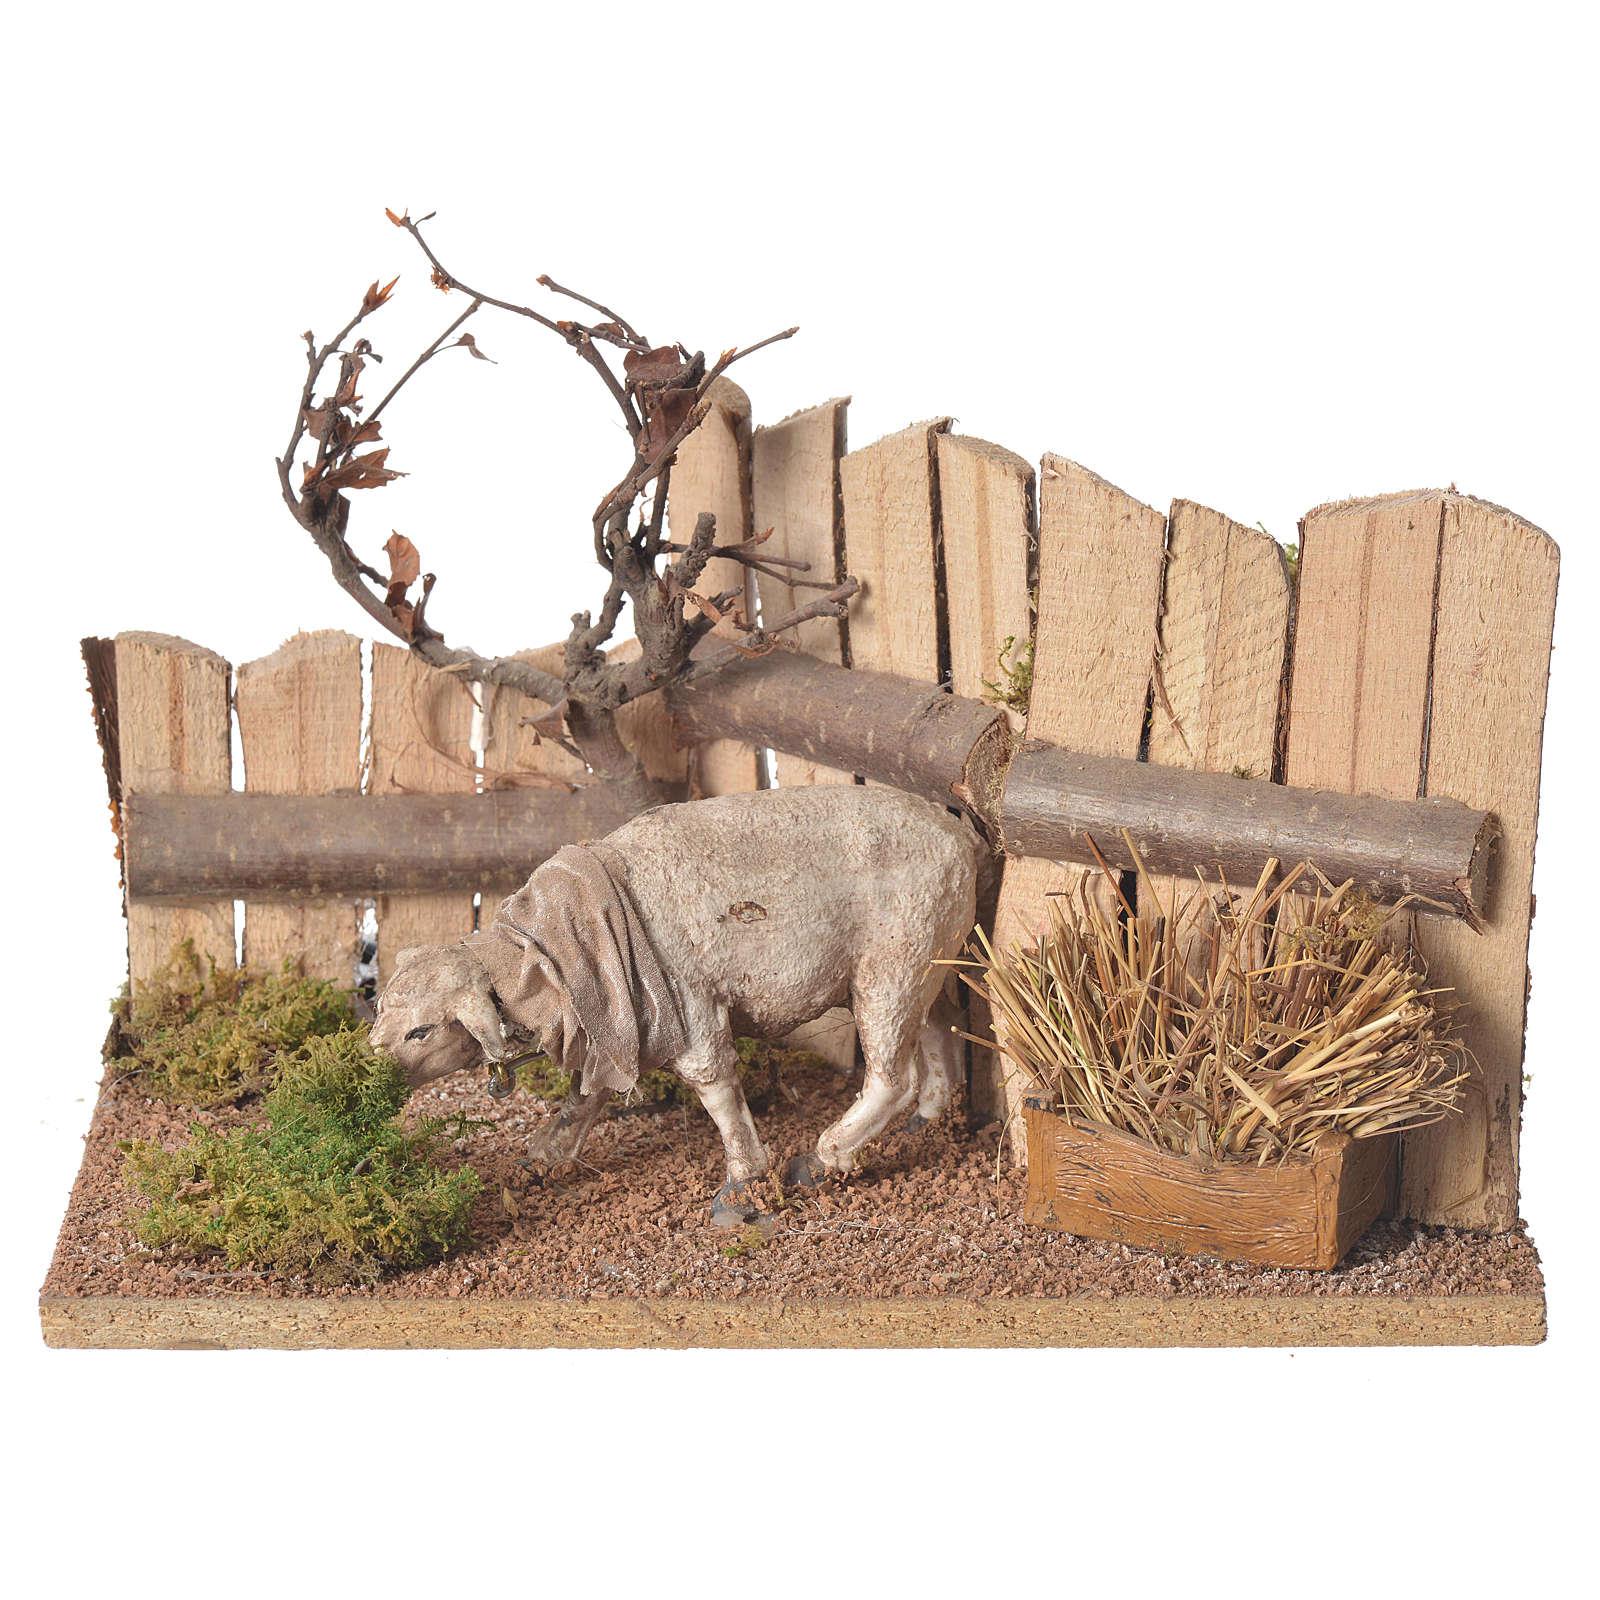 Movimiento belén 15 cm oveja 15x15x15 3